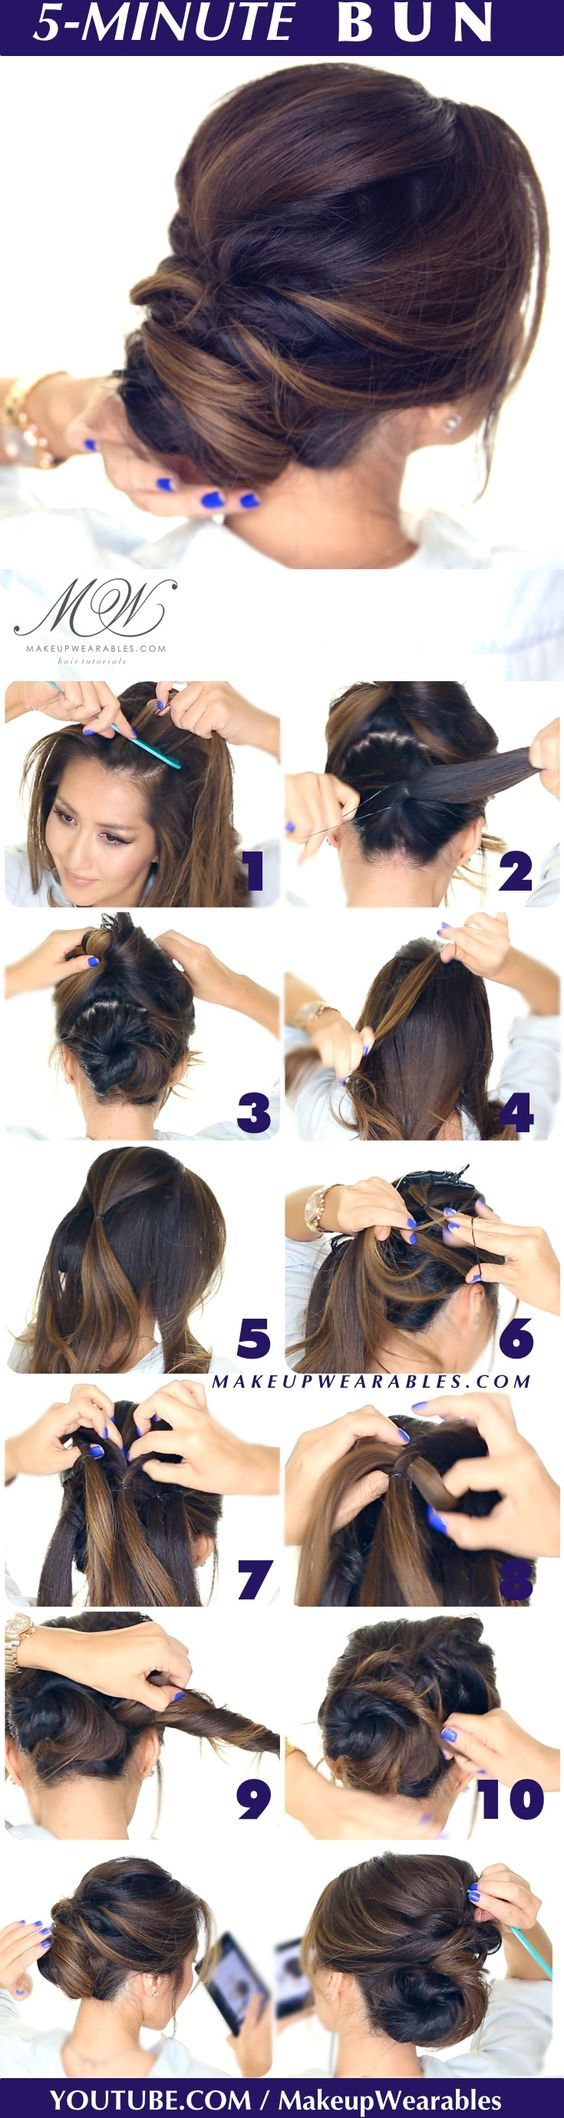 hair tutorial - easy romantic bun hairstyle - Elegant twisted bun hairstyles for...